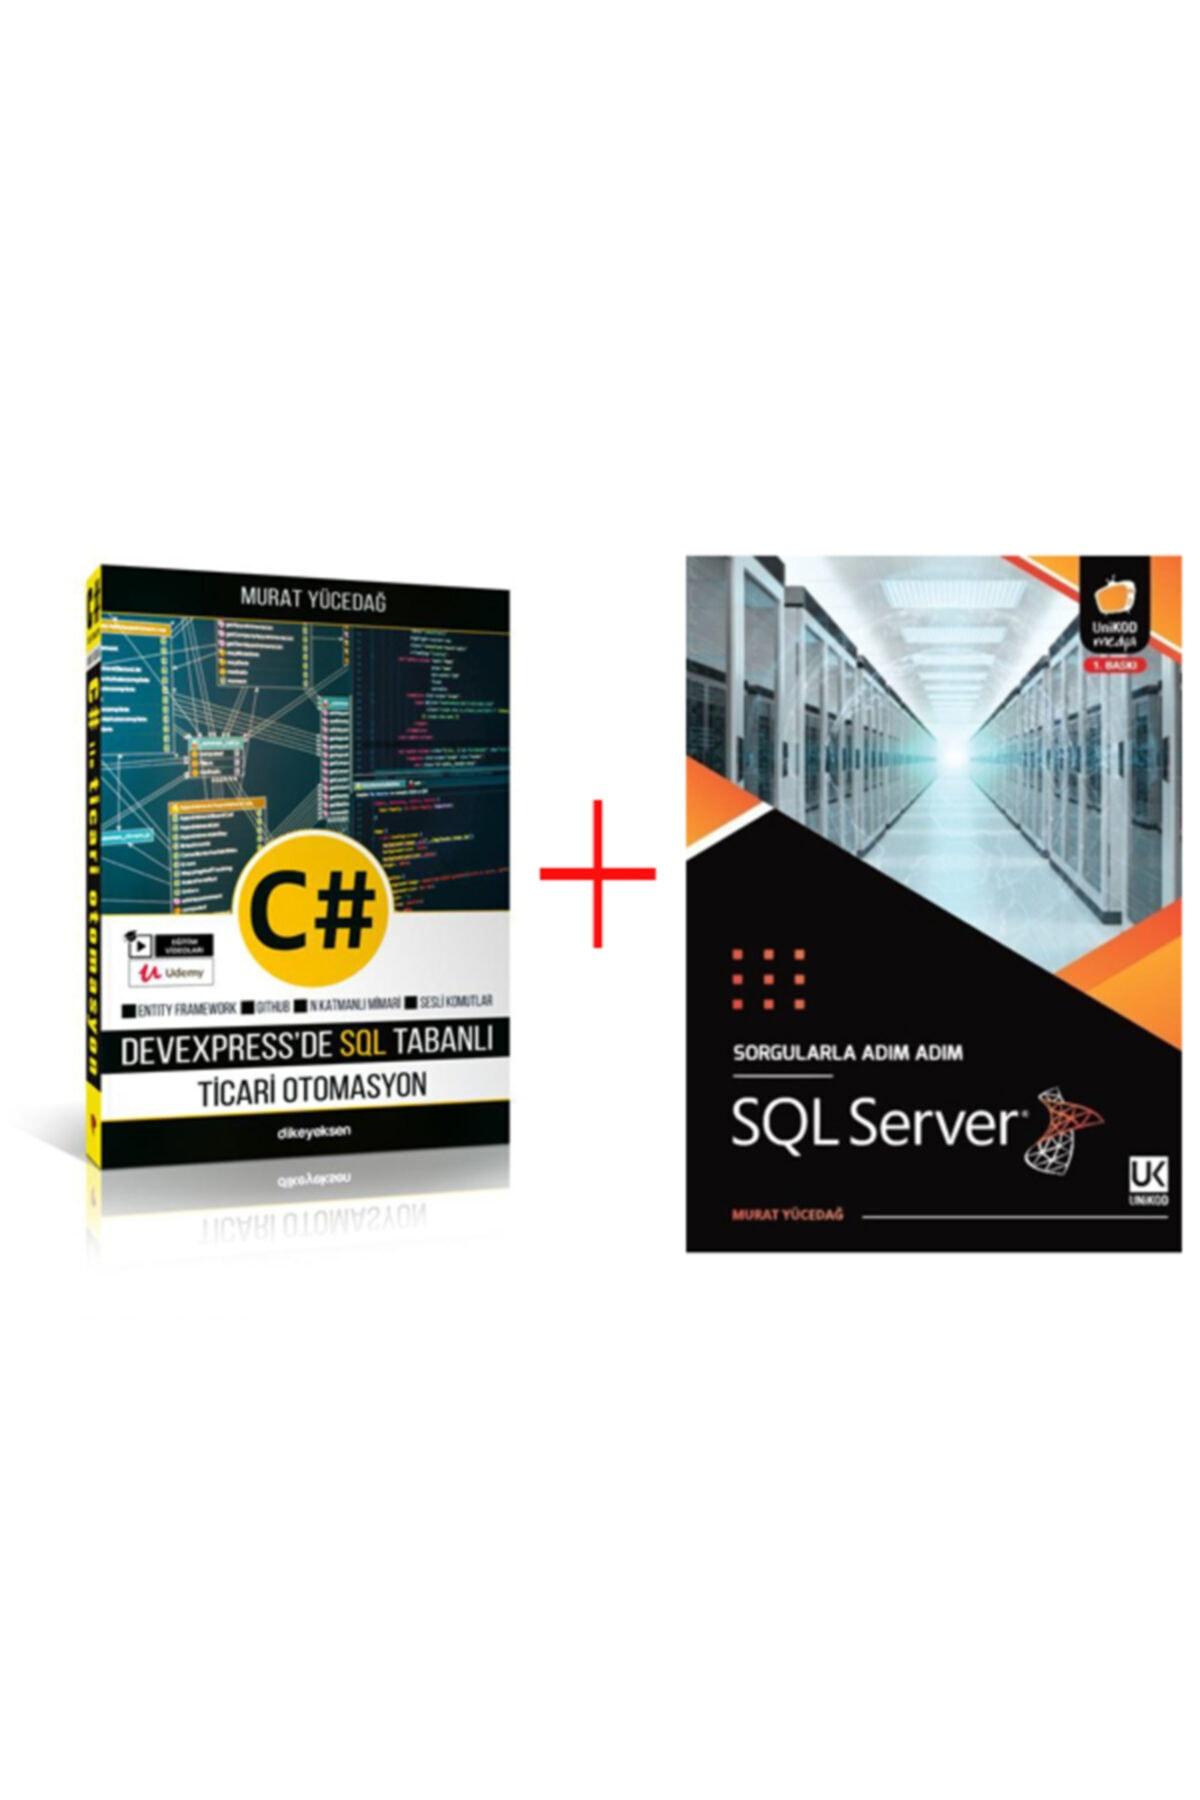 Murat Yücedağ Sql Server & Devexpress'de Sql Tabanlı Ticari Otomasyon